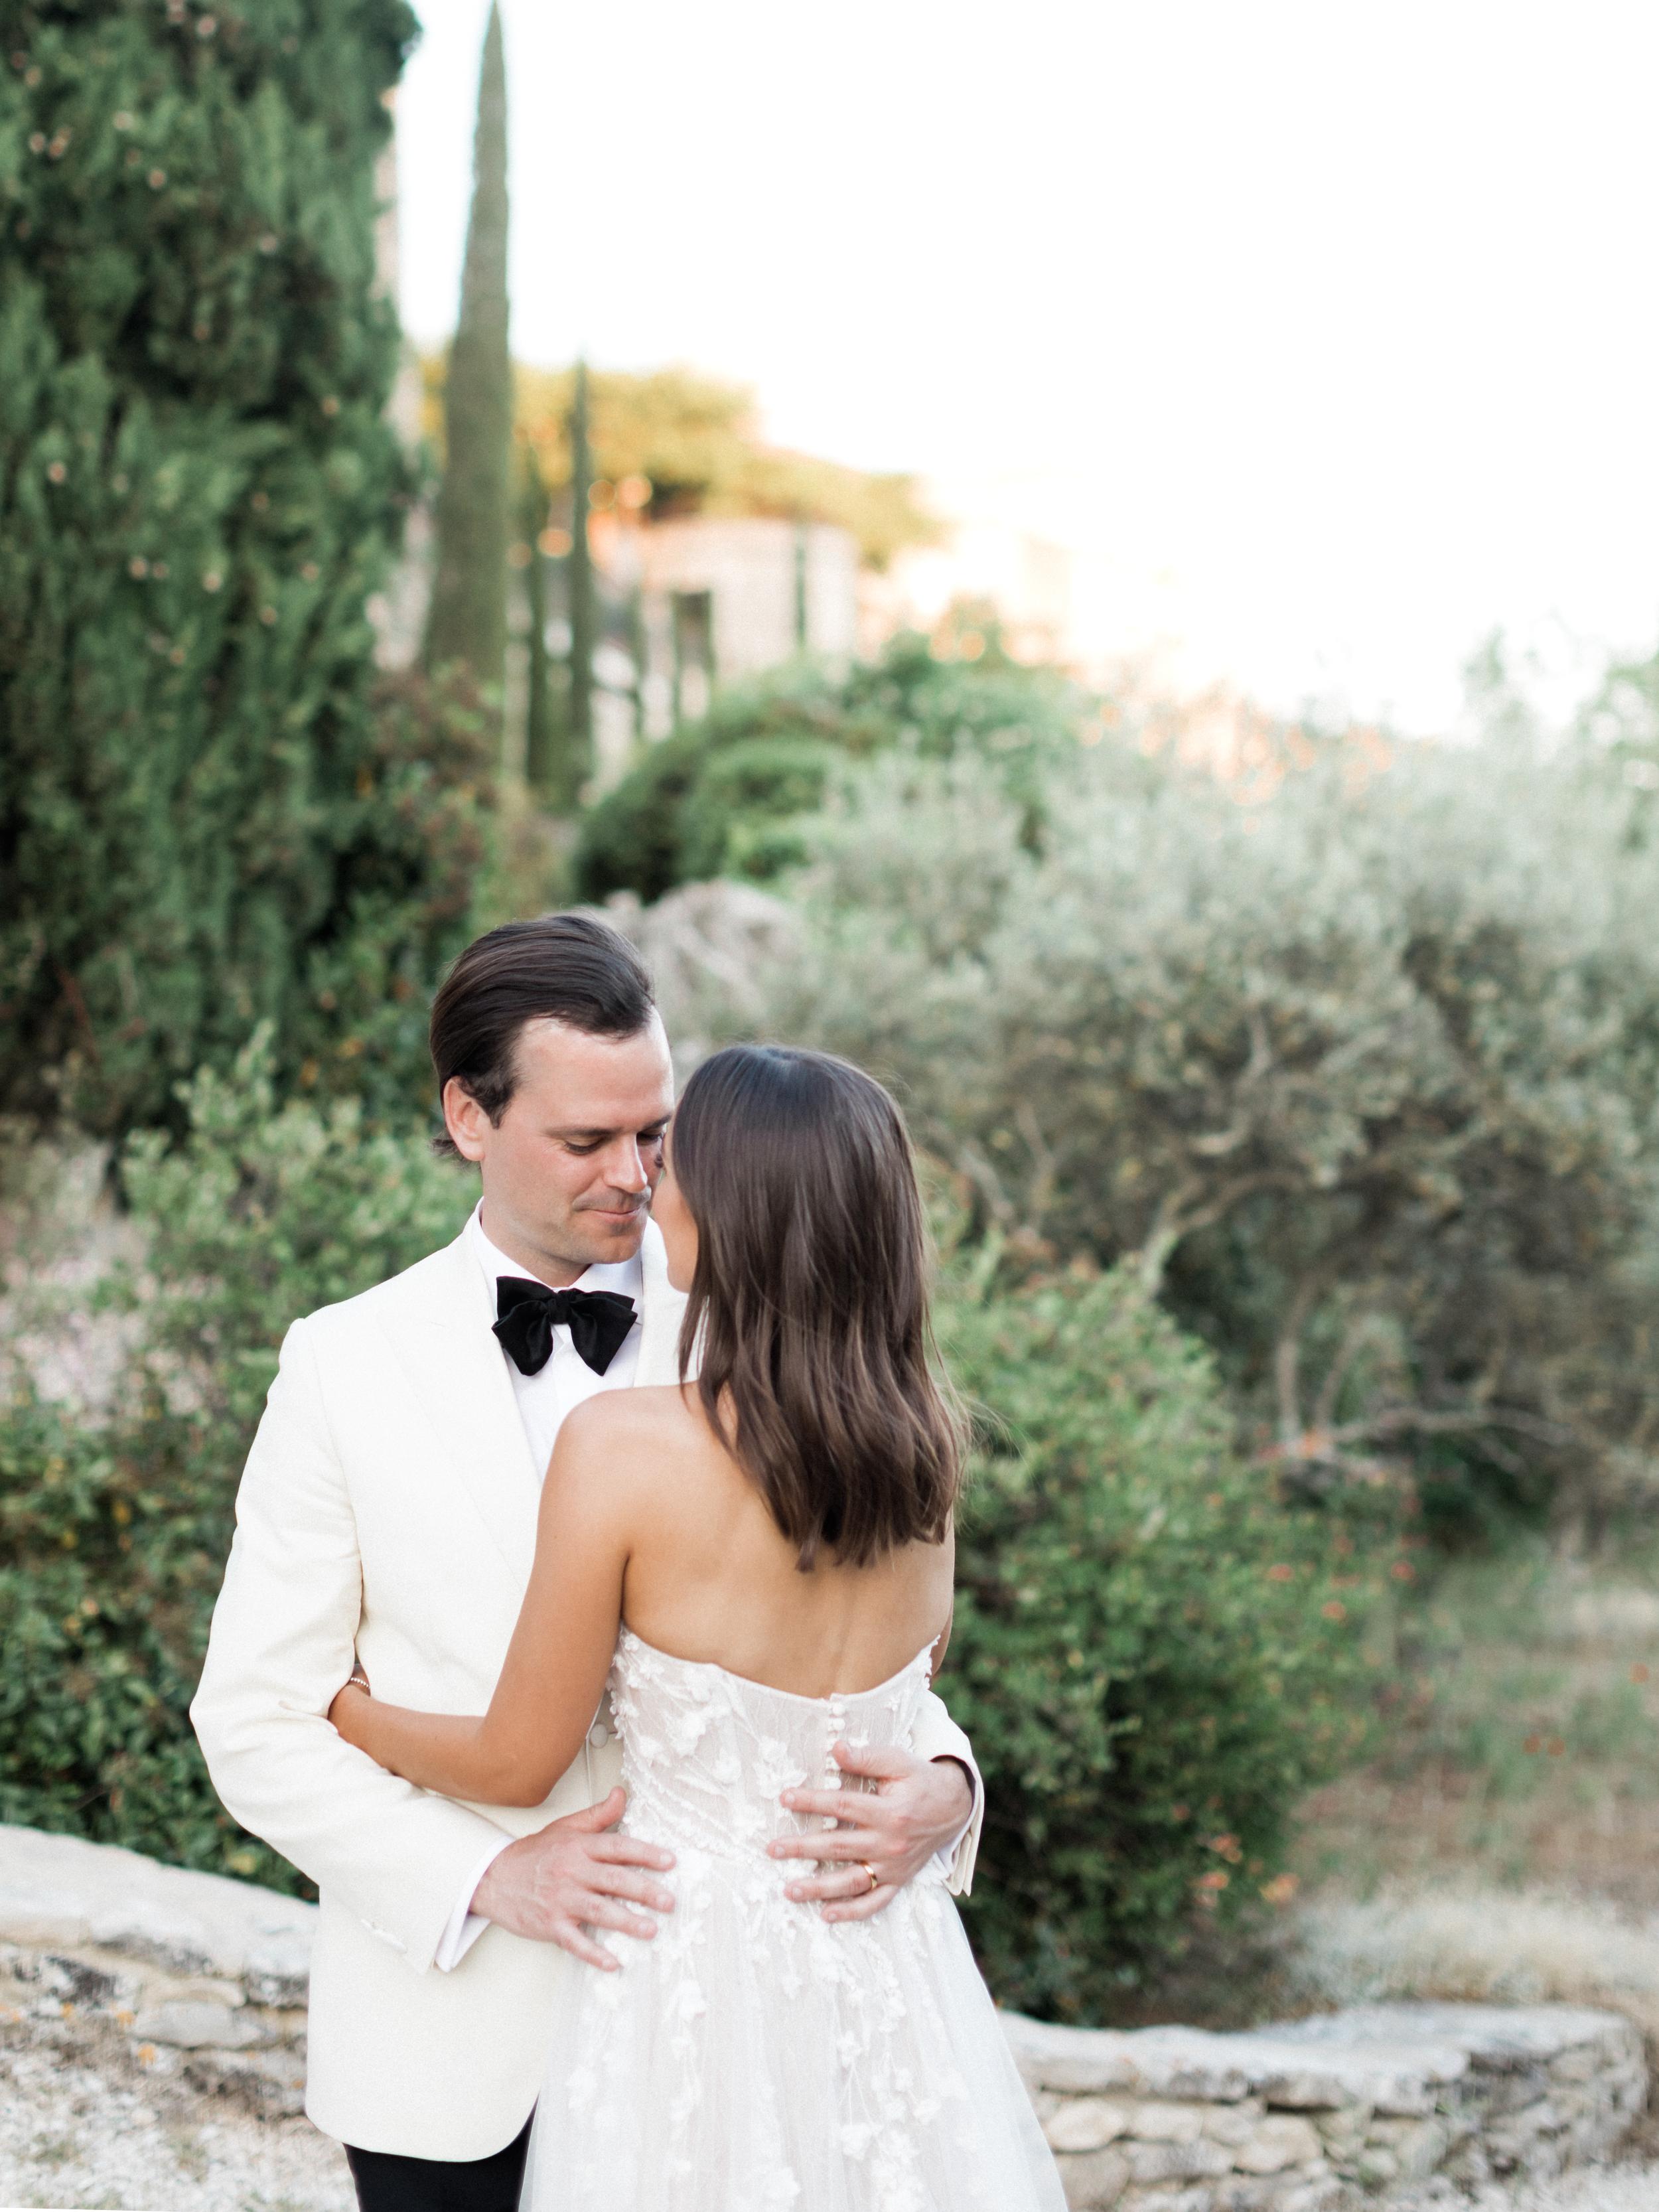 bastide_de_gordes_provence_wedding_(c)_rory-wylie-71.jpg